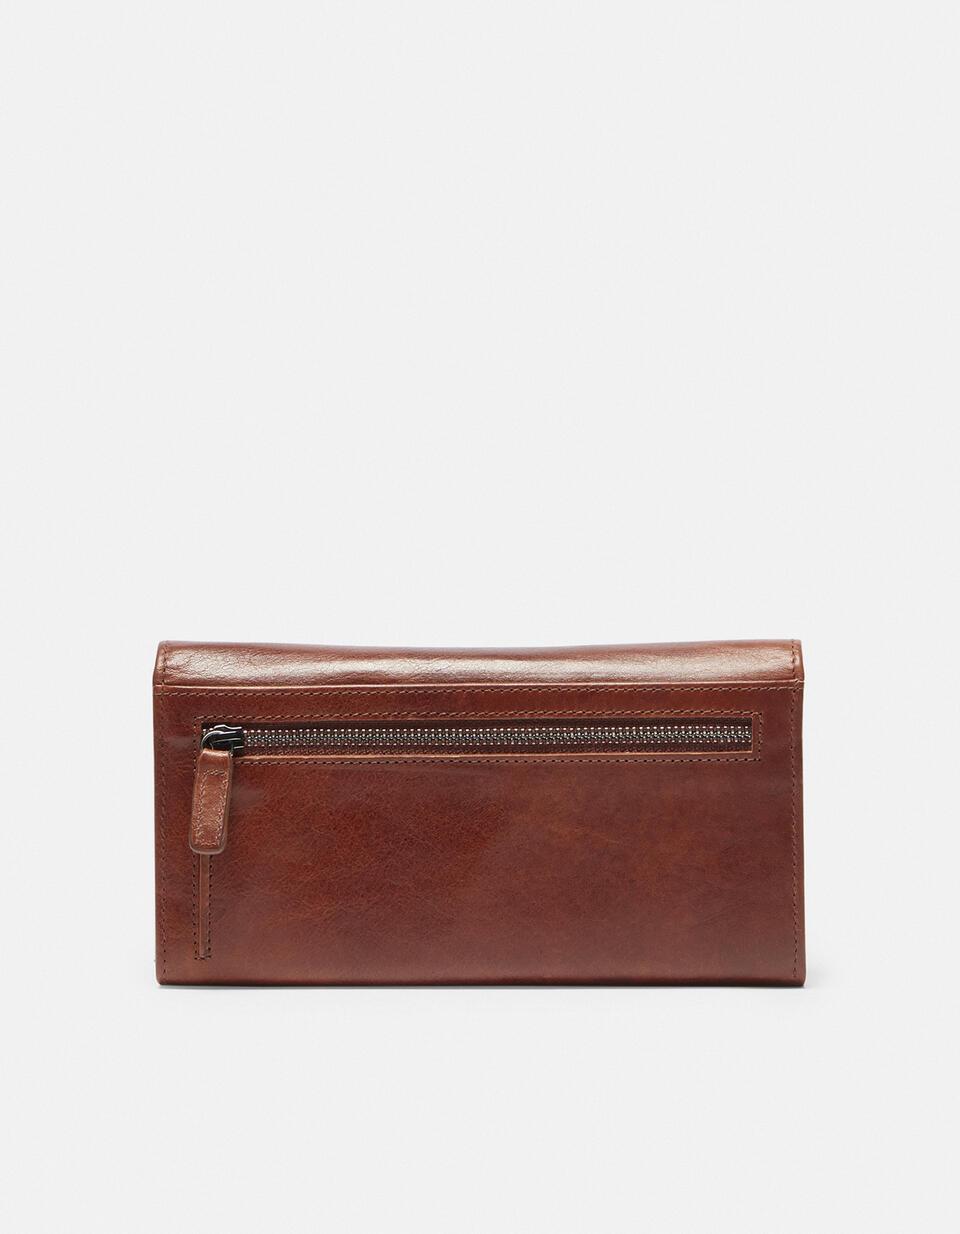 Anti-rfid leather wallet Warm and colour MARRONE Cuoieria Fiorentina